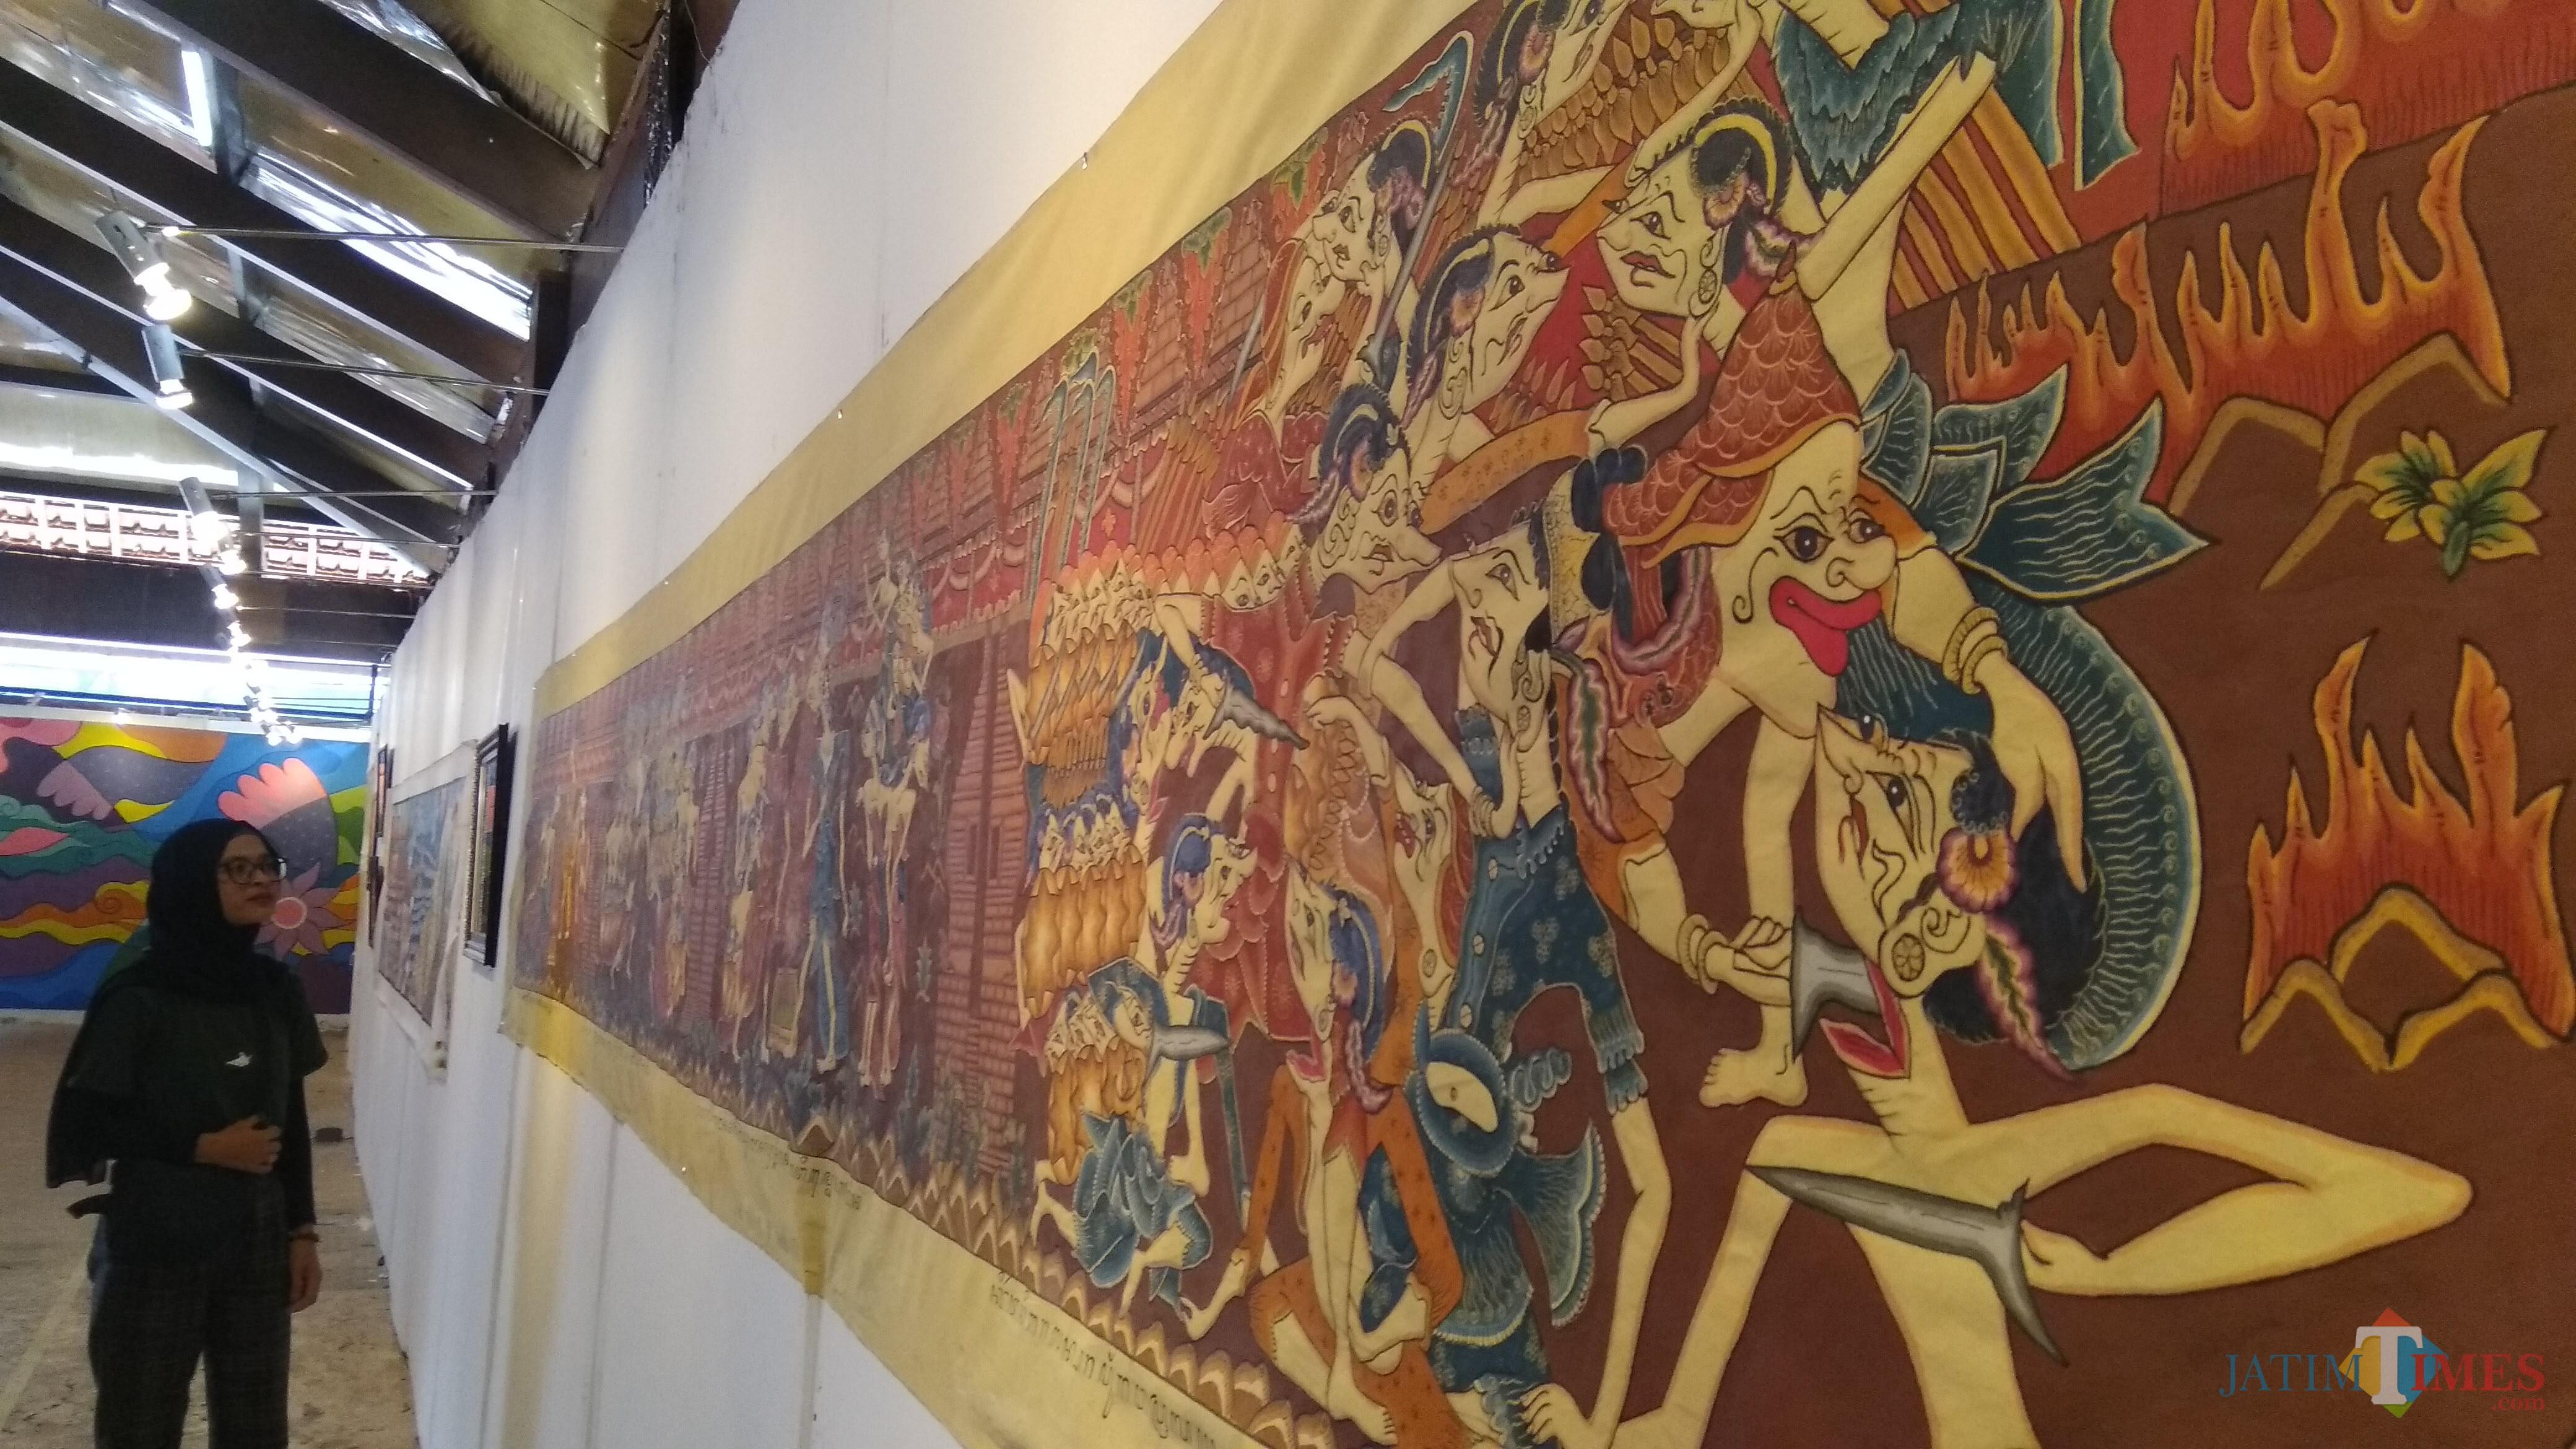 Dari Klasik Hingga Kontemporer Menilik Pameran Visual Budaya Panji Di Malang Malangtimes